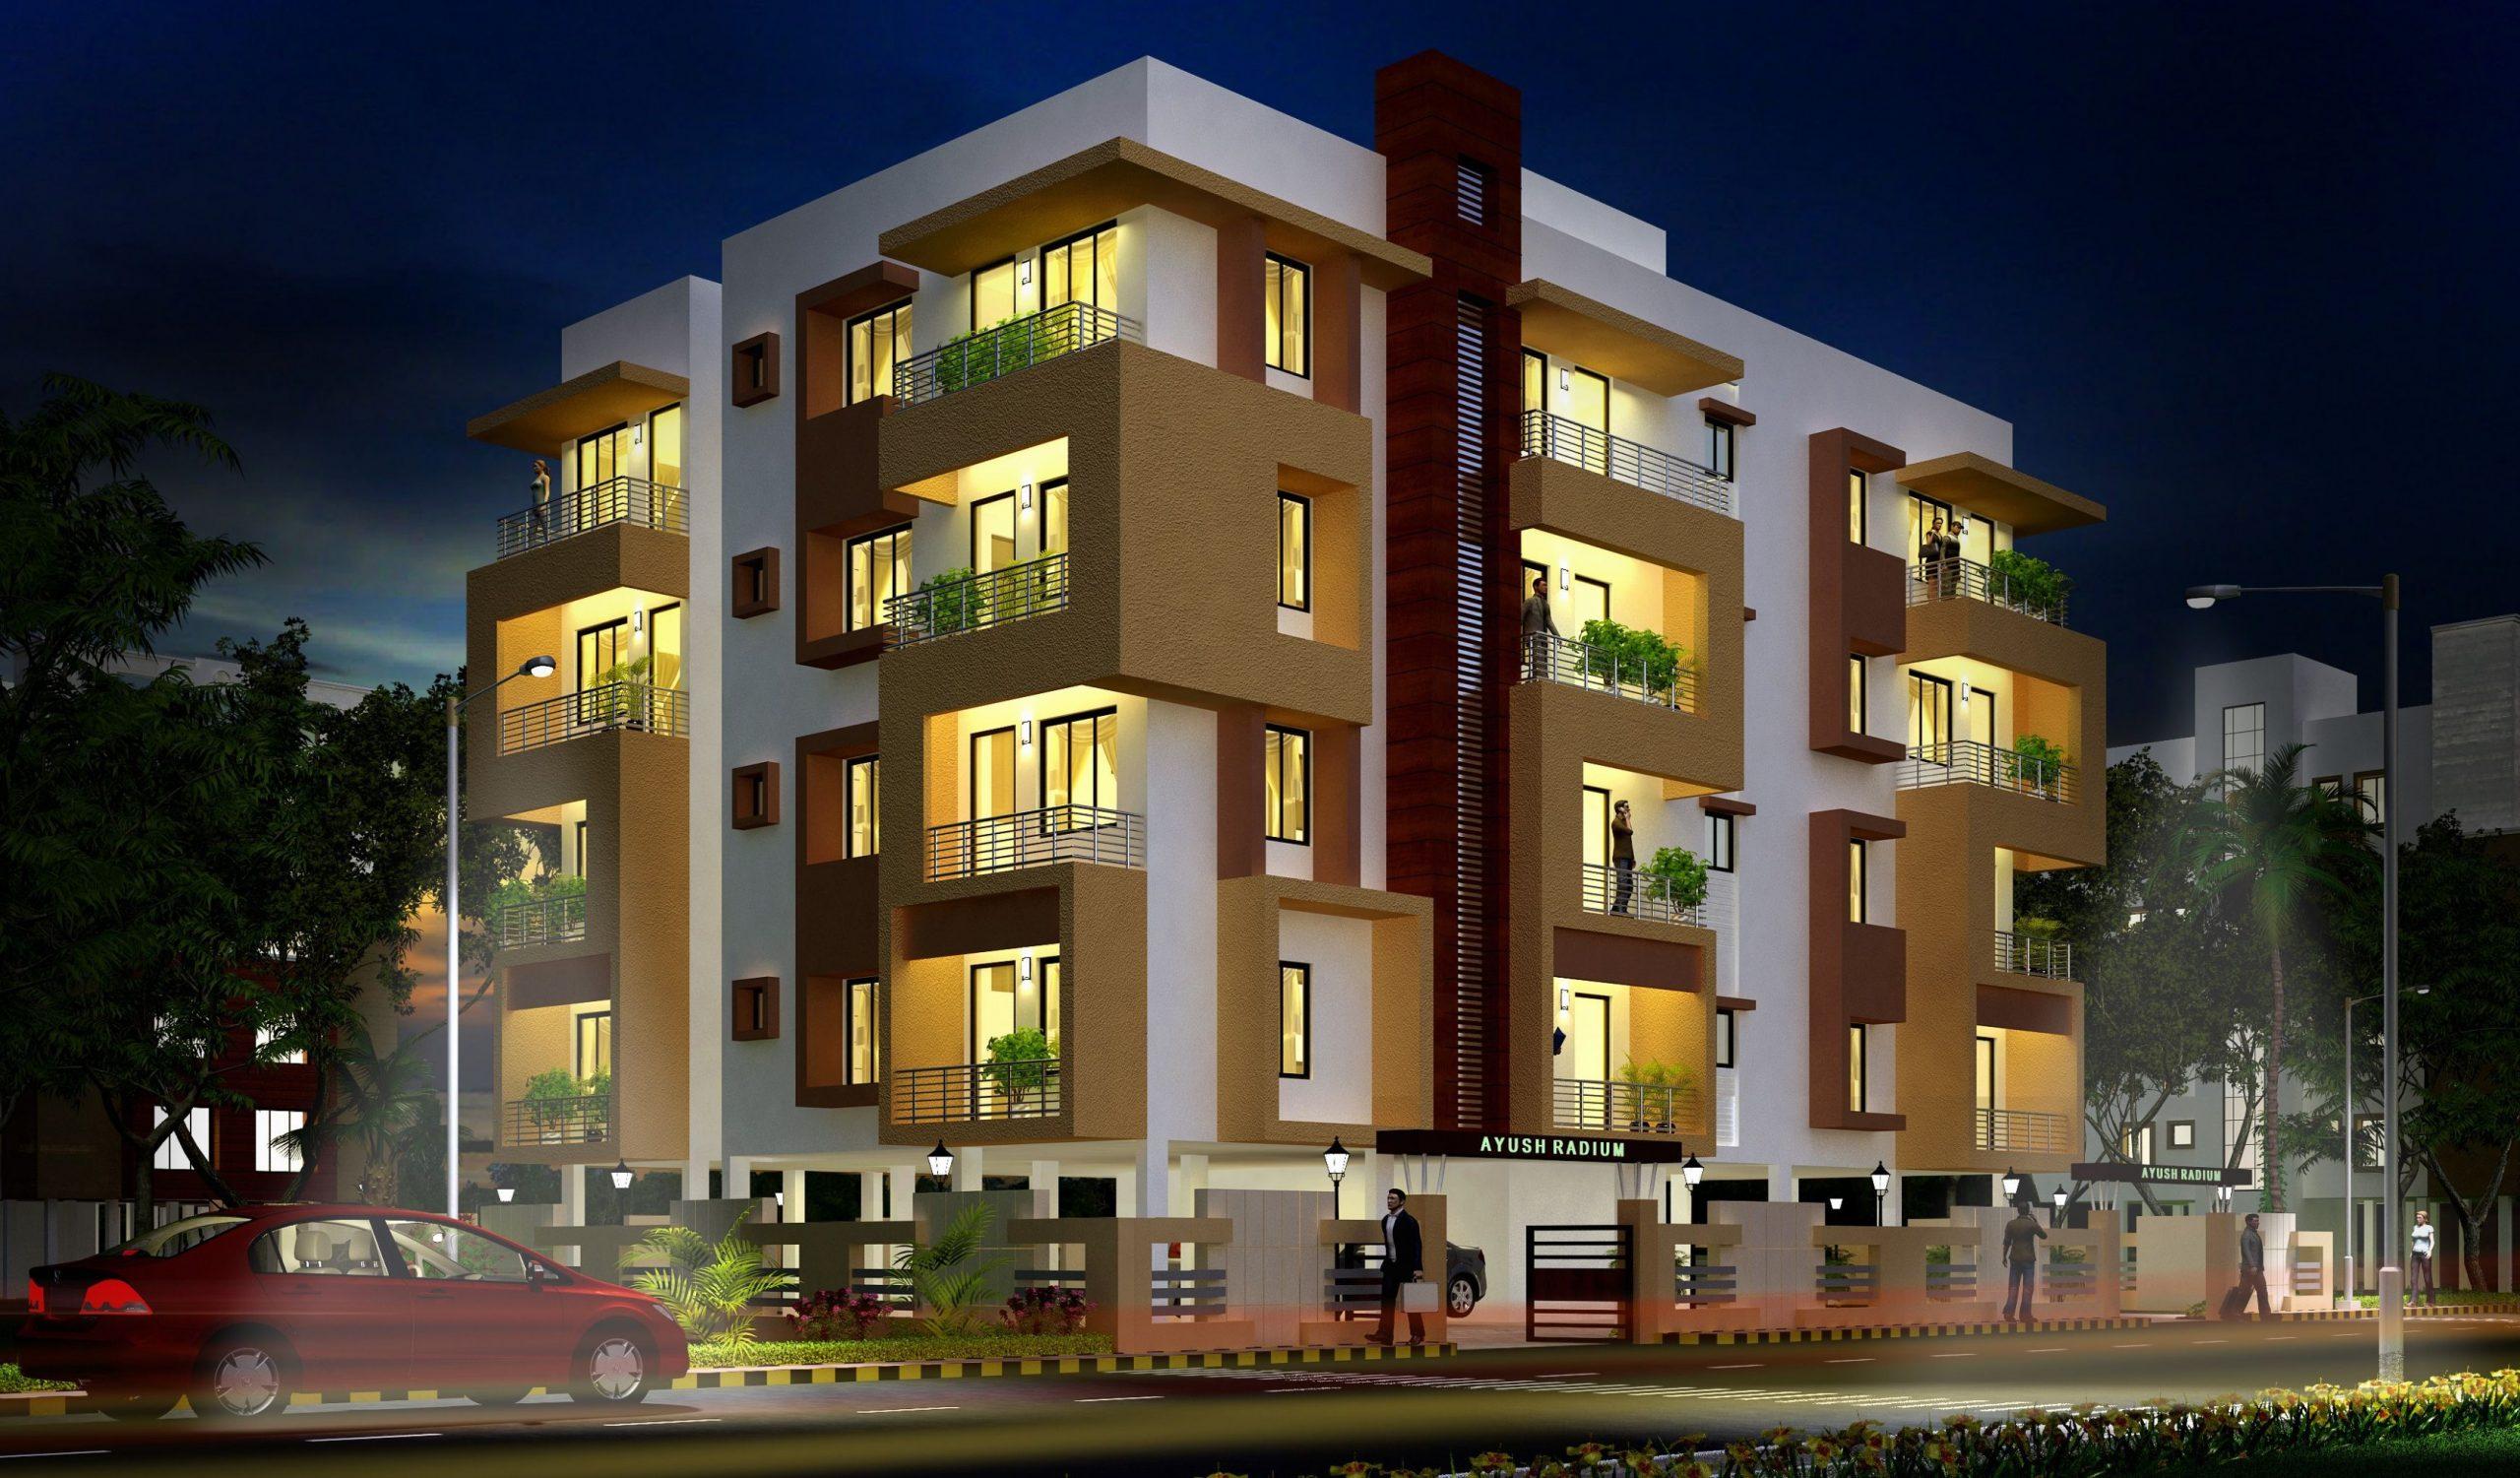 house-apartment-exterior-design-ideas-waplag-awesome-modern_best  - Apartment Exterior Design Ideas